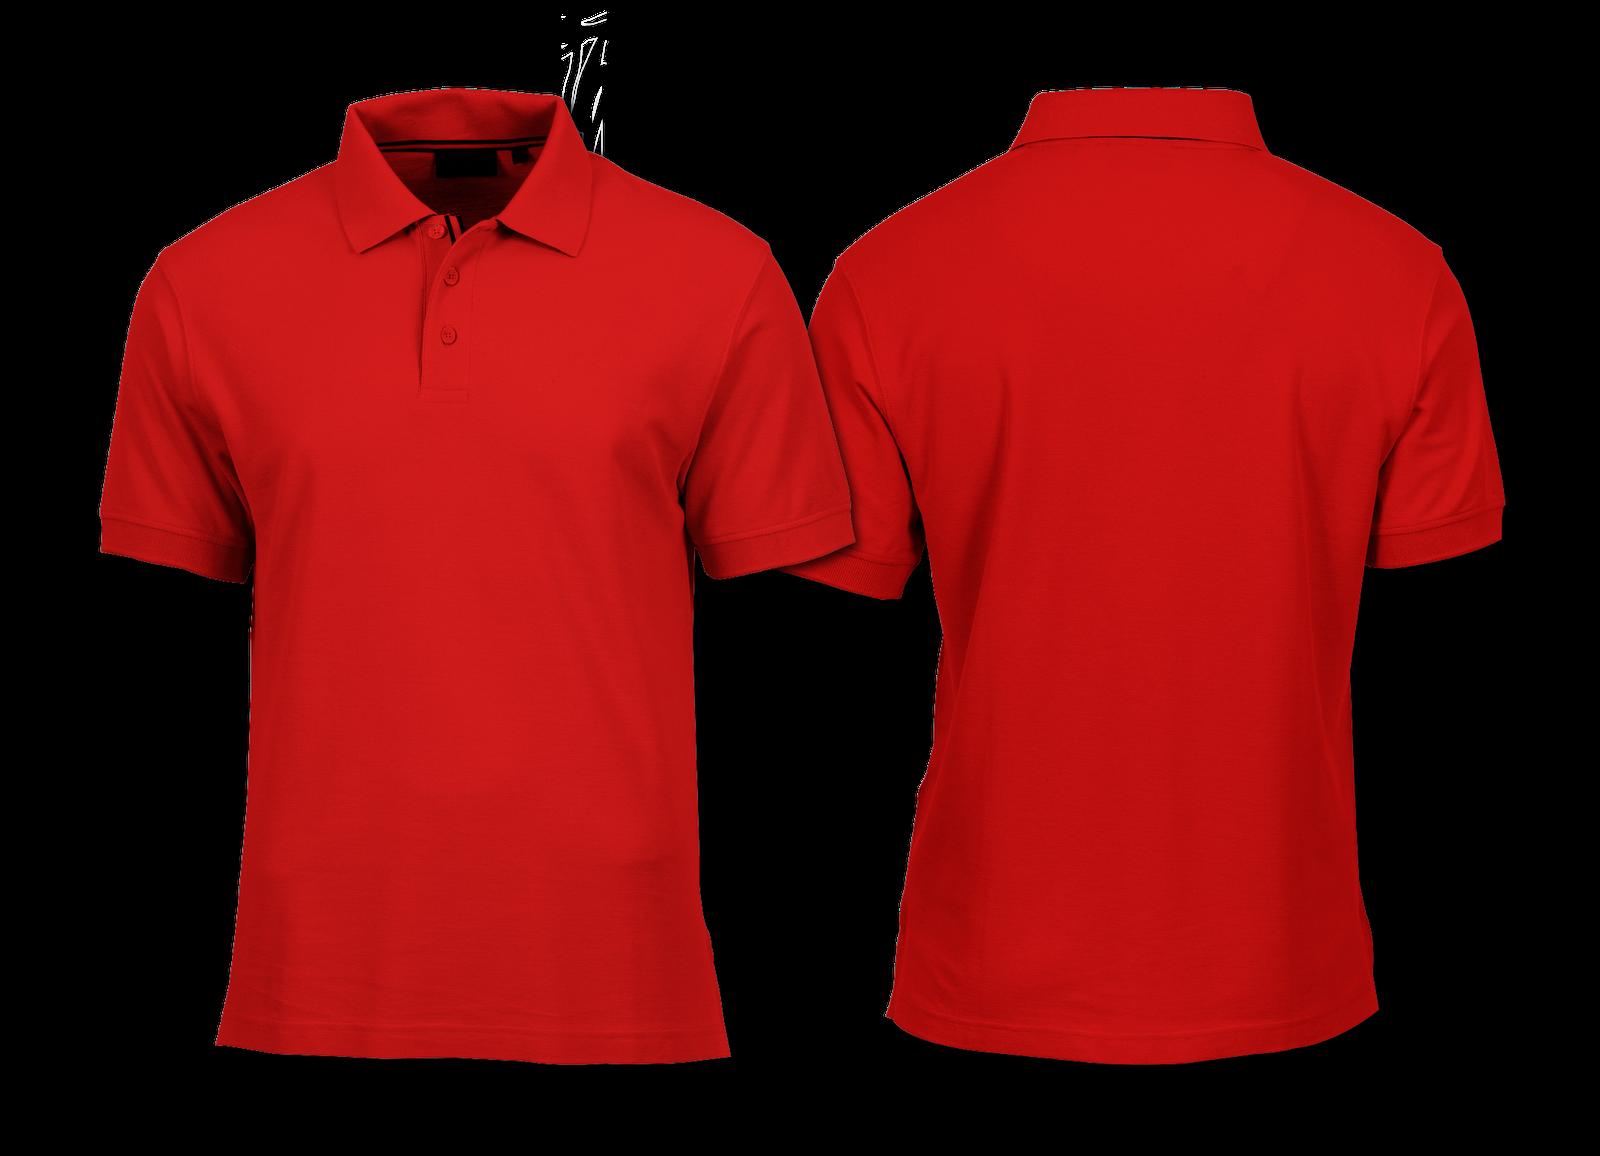 29 Polo Shirt Contoh Kaos Polos Warna Merah